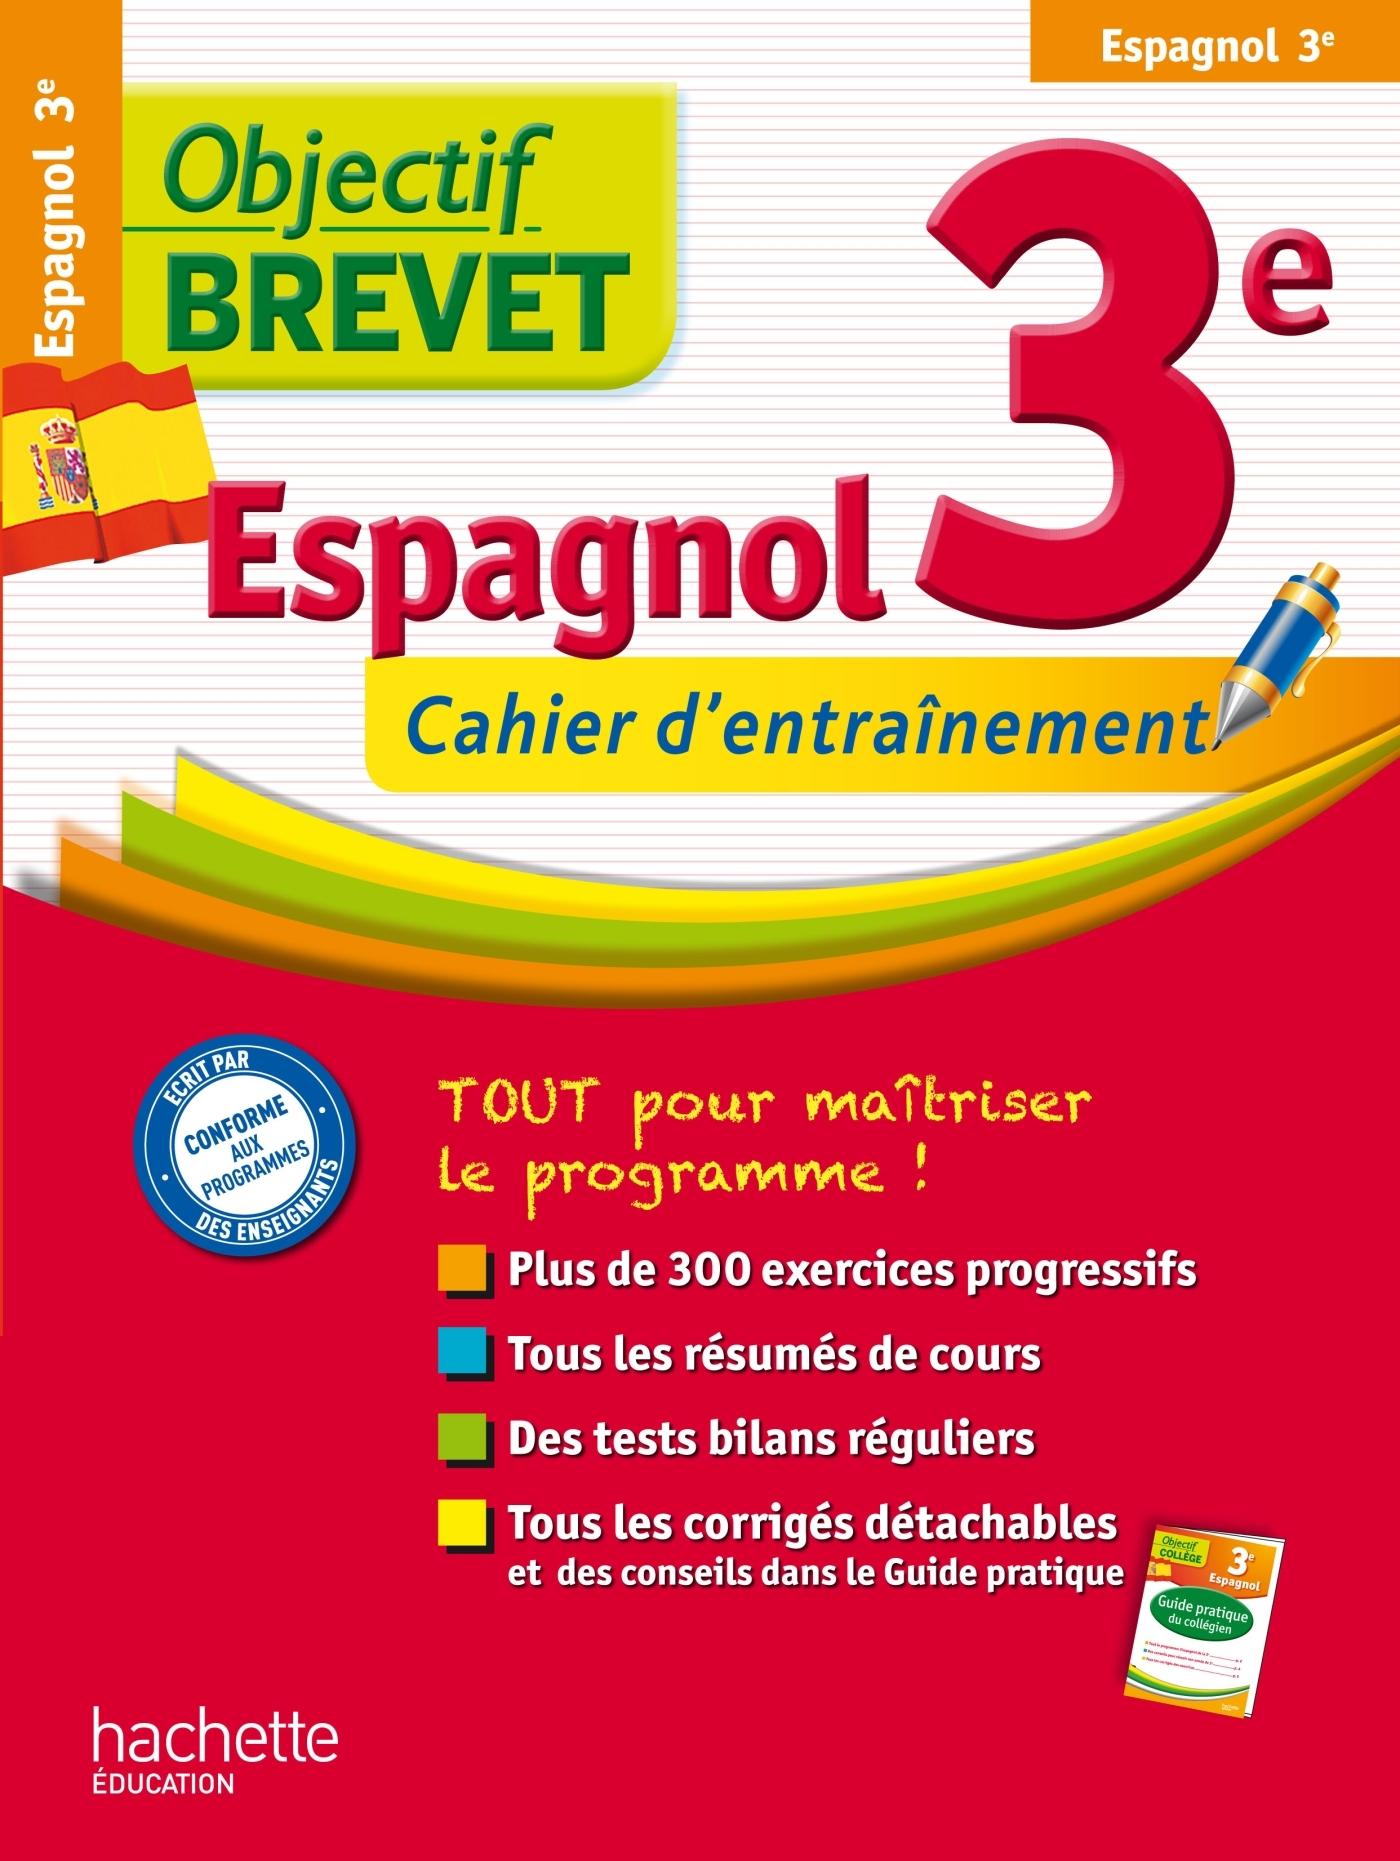 OBJECTIF BREVET ESPAGNOL 3EME